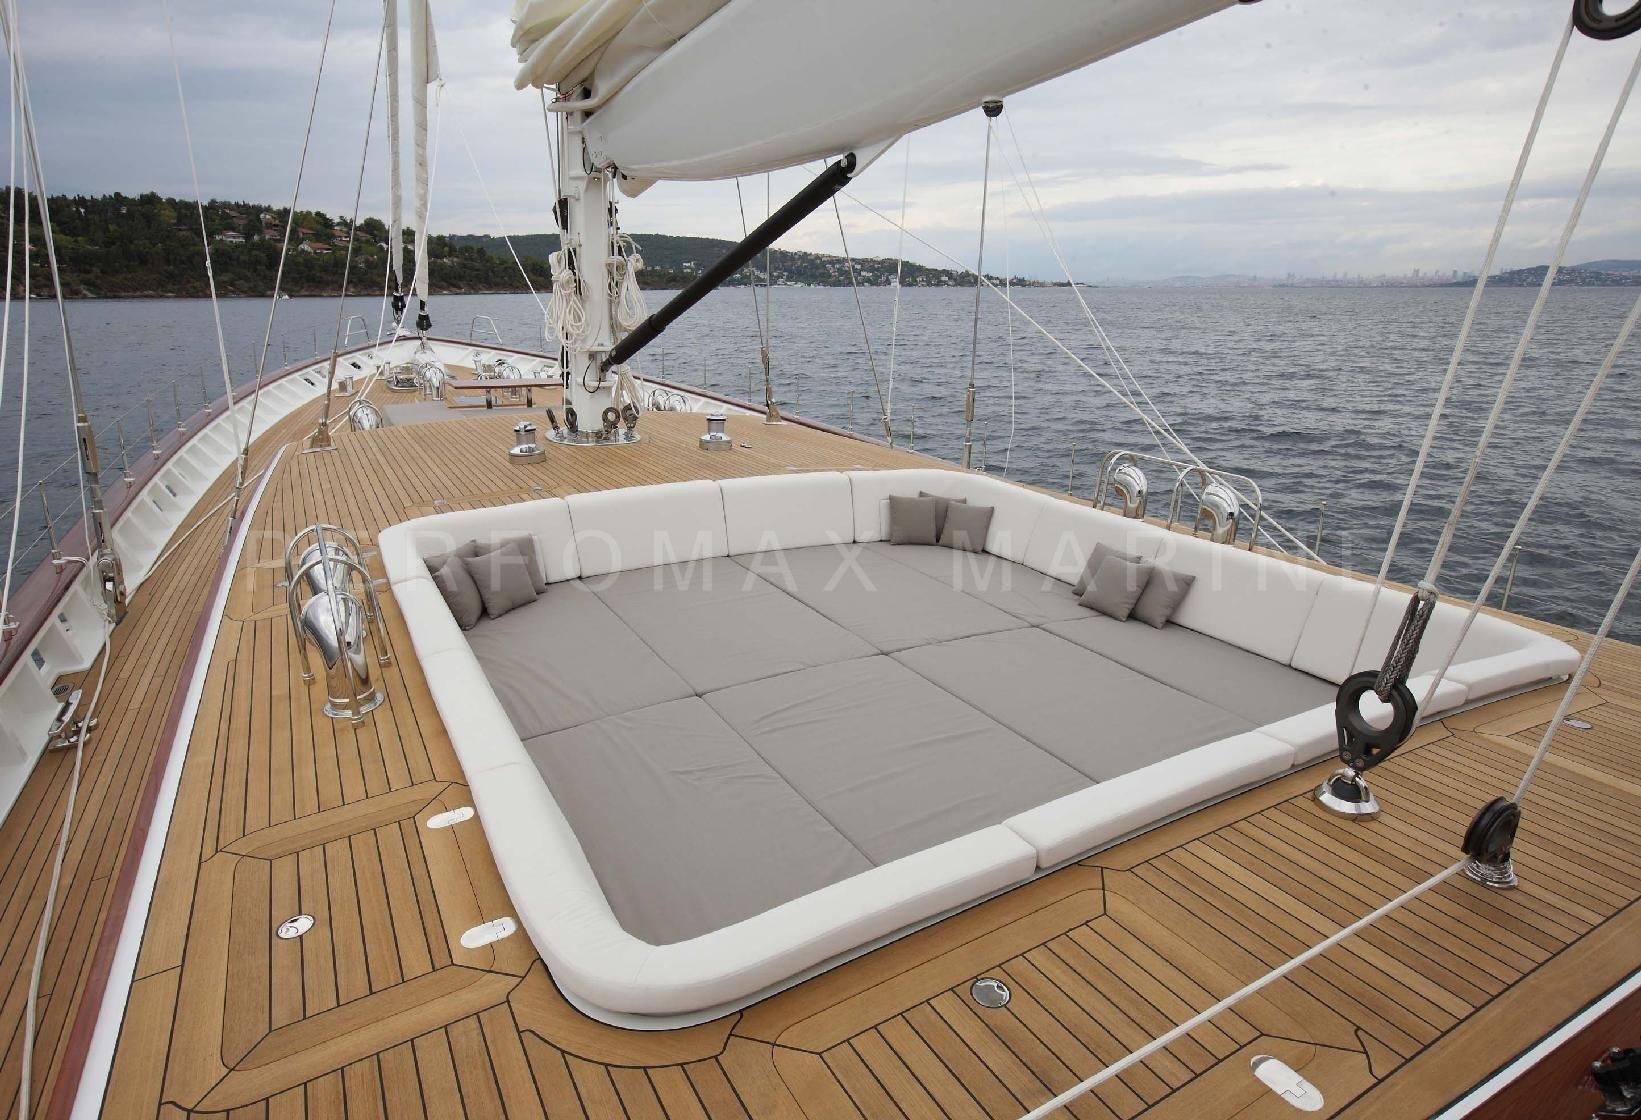 2013 Su_Yachts_40M_Gulet-1_page27_image24